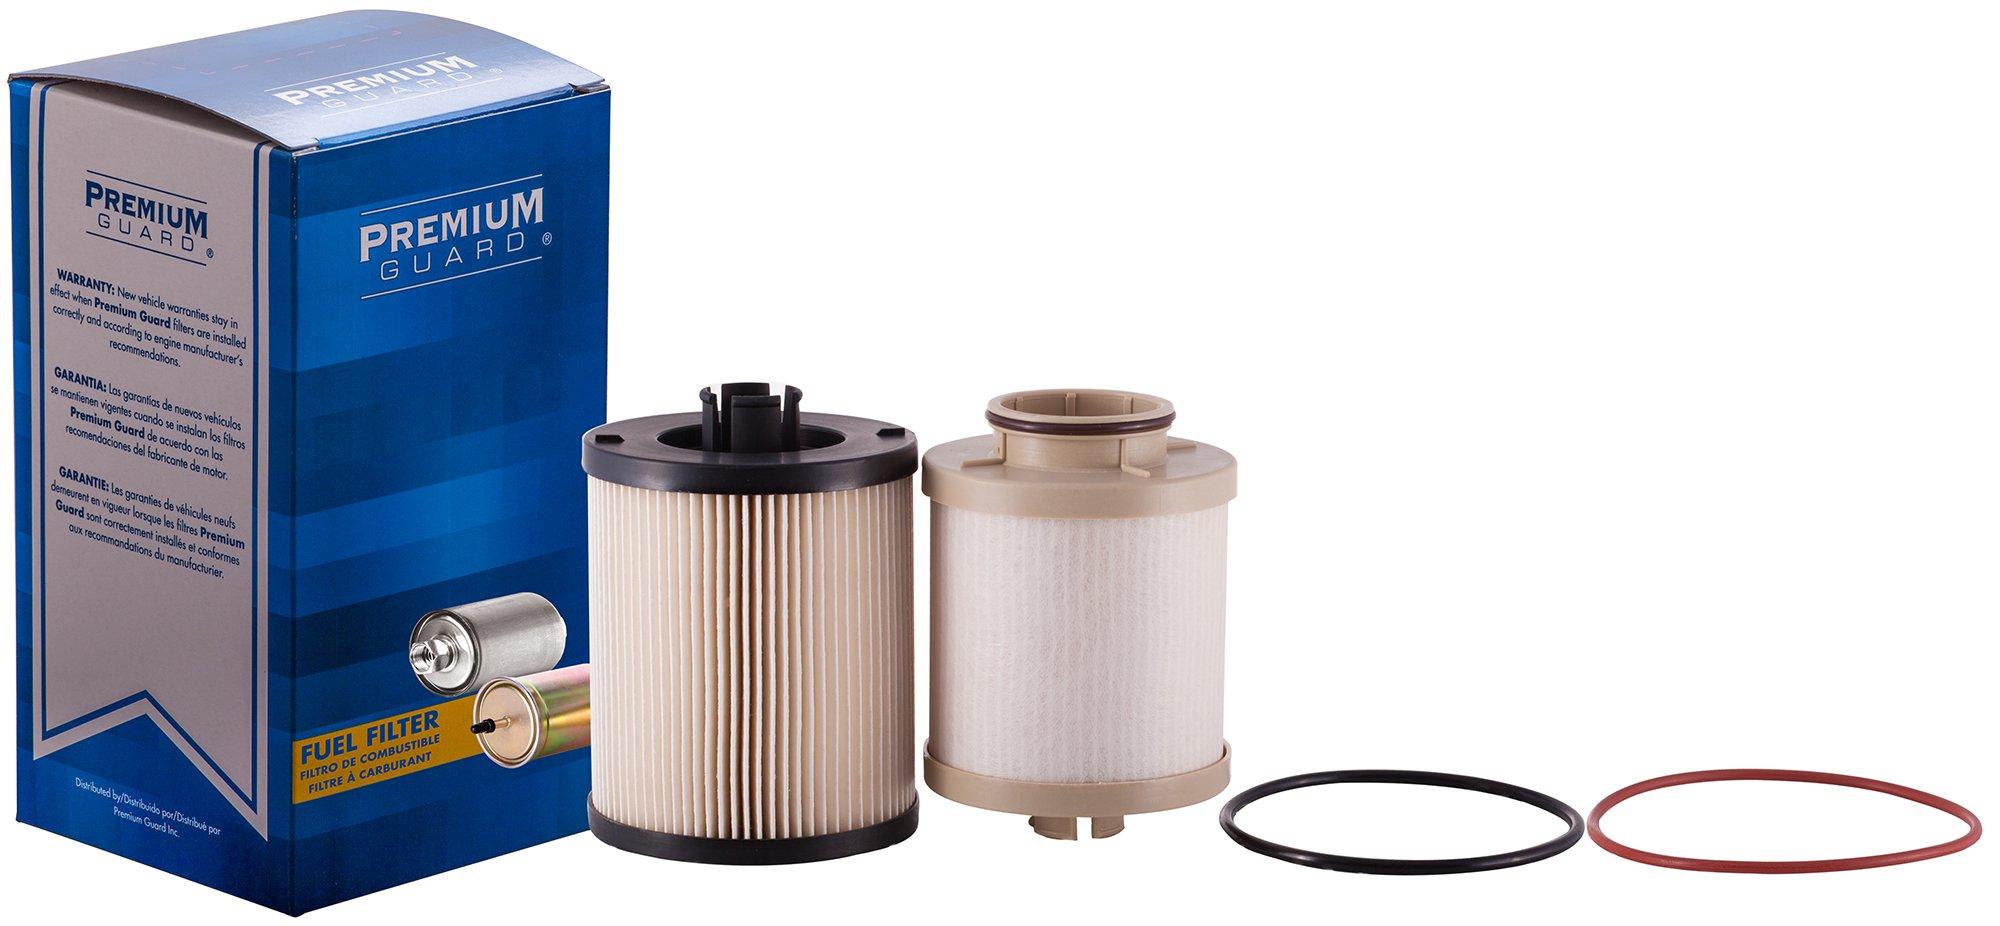 PG Diesel Fuel Filter DF4609A | Fits 2008-10 Ford F-250 Super Duty, 2008-10 F-350 Super Duty by Premium Guard